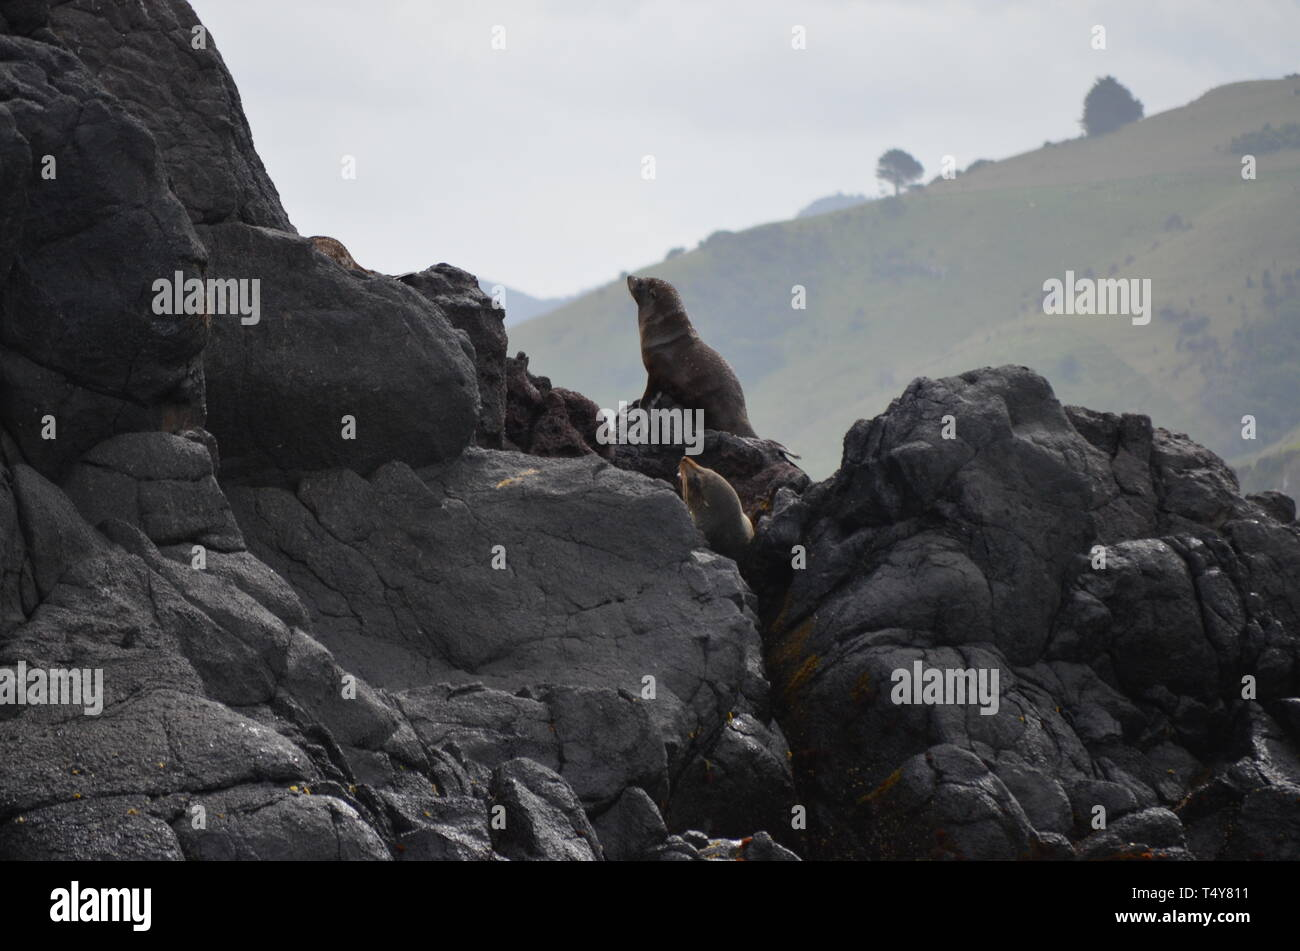 Sea Lions in New Zealand - Dunedin - Stock Image